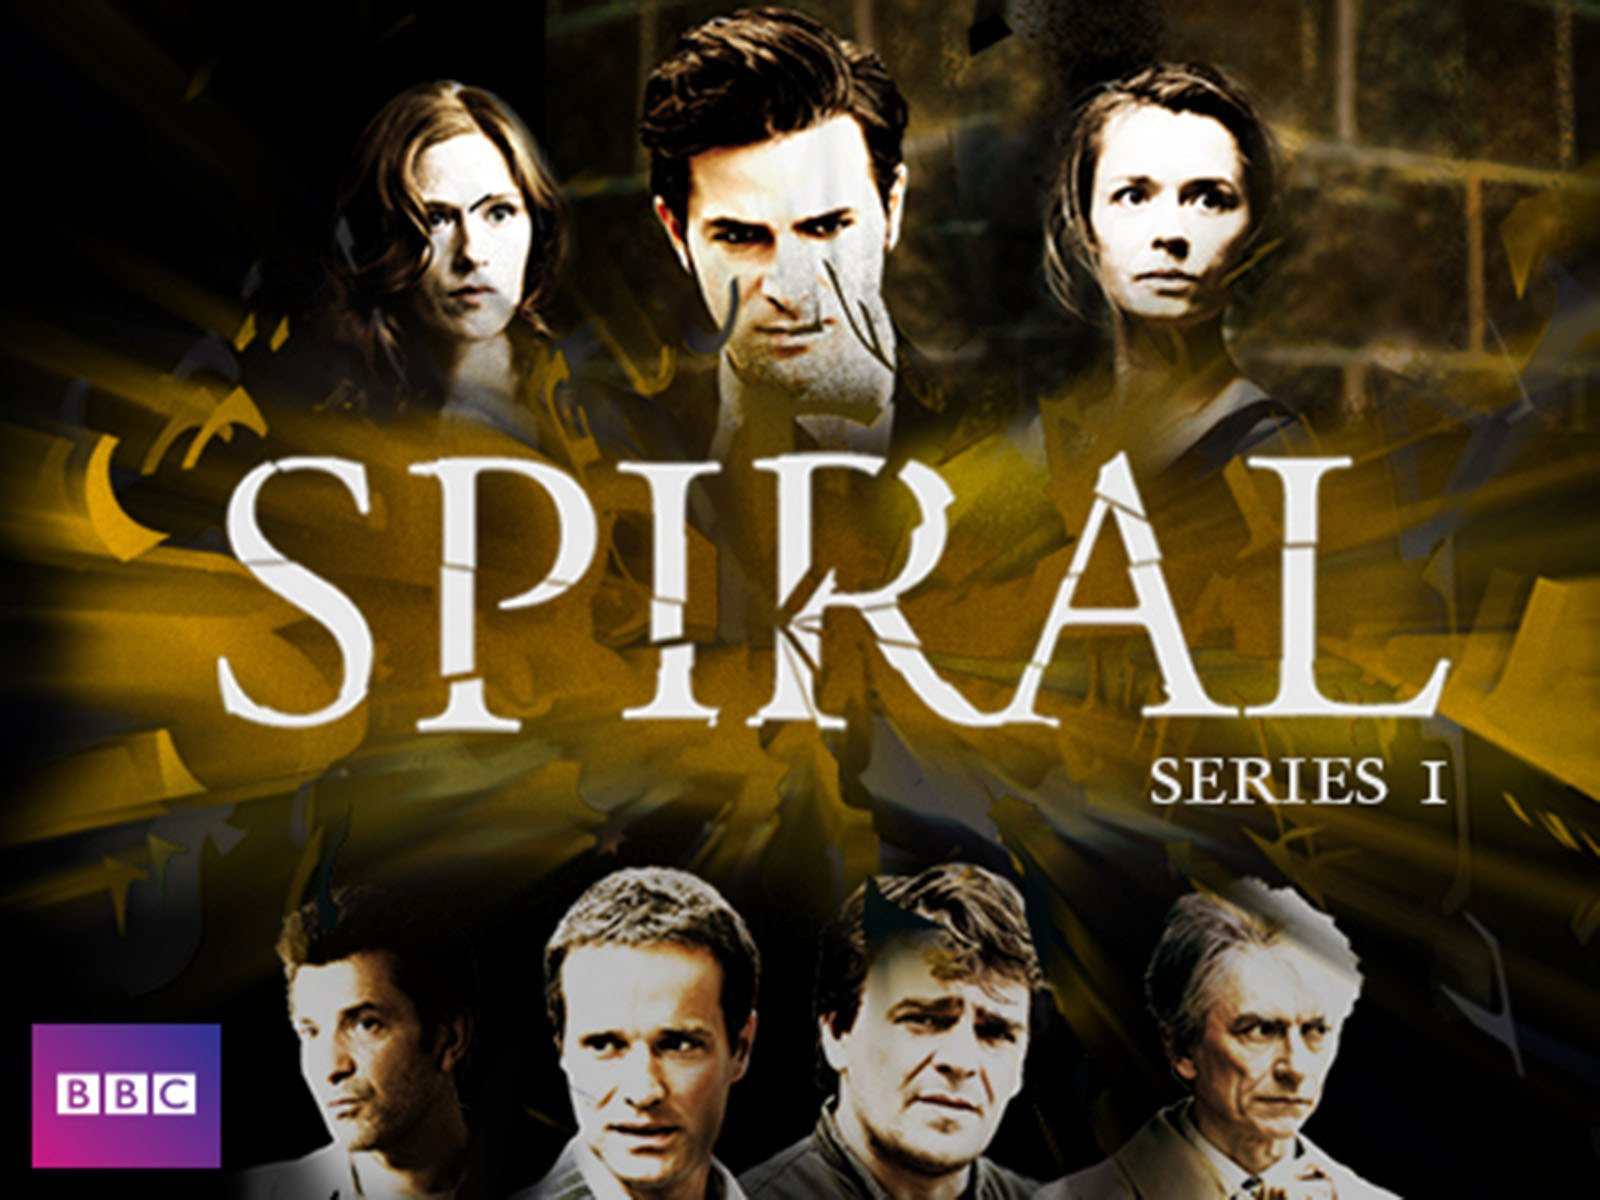 Amazoncouk Watch Spiral Season 1 Subtitled Prime Video